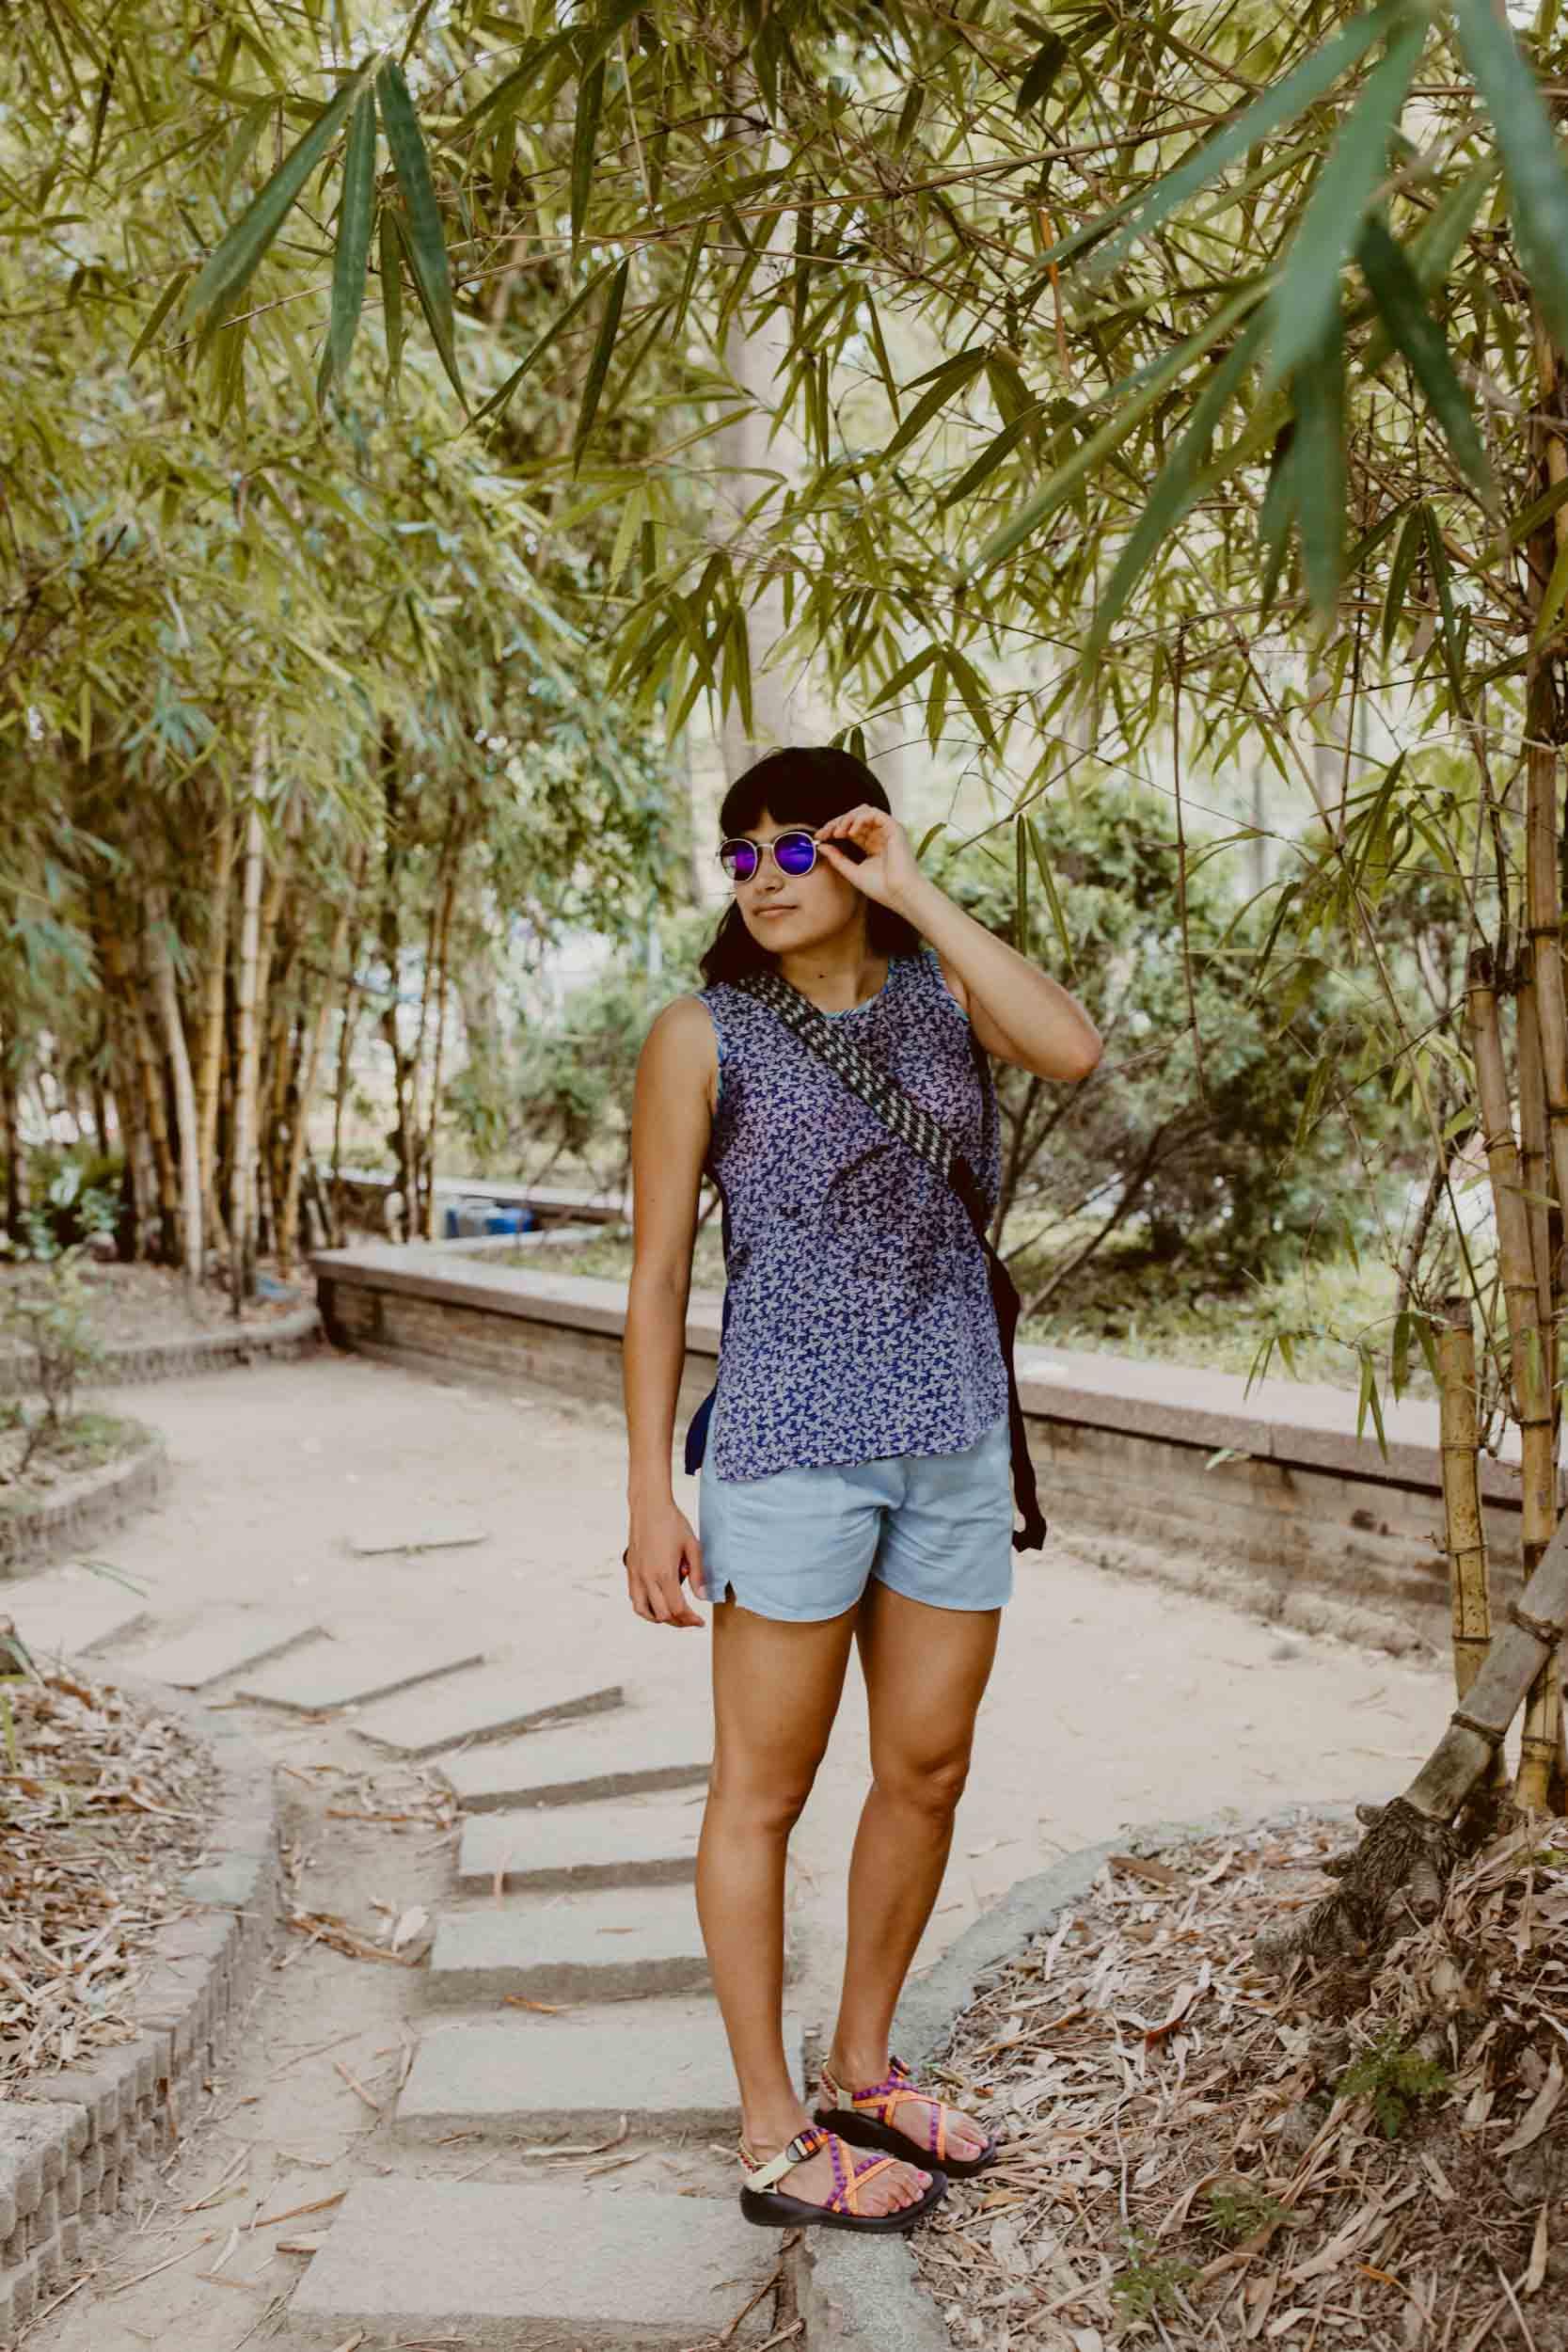 Miriam-Subbiah-taiwan-14.jpg